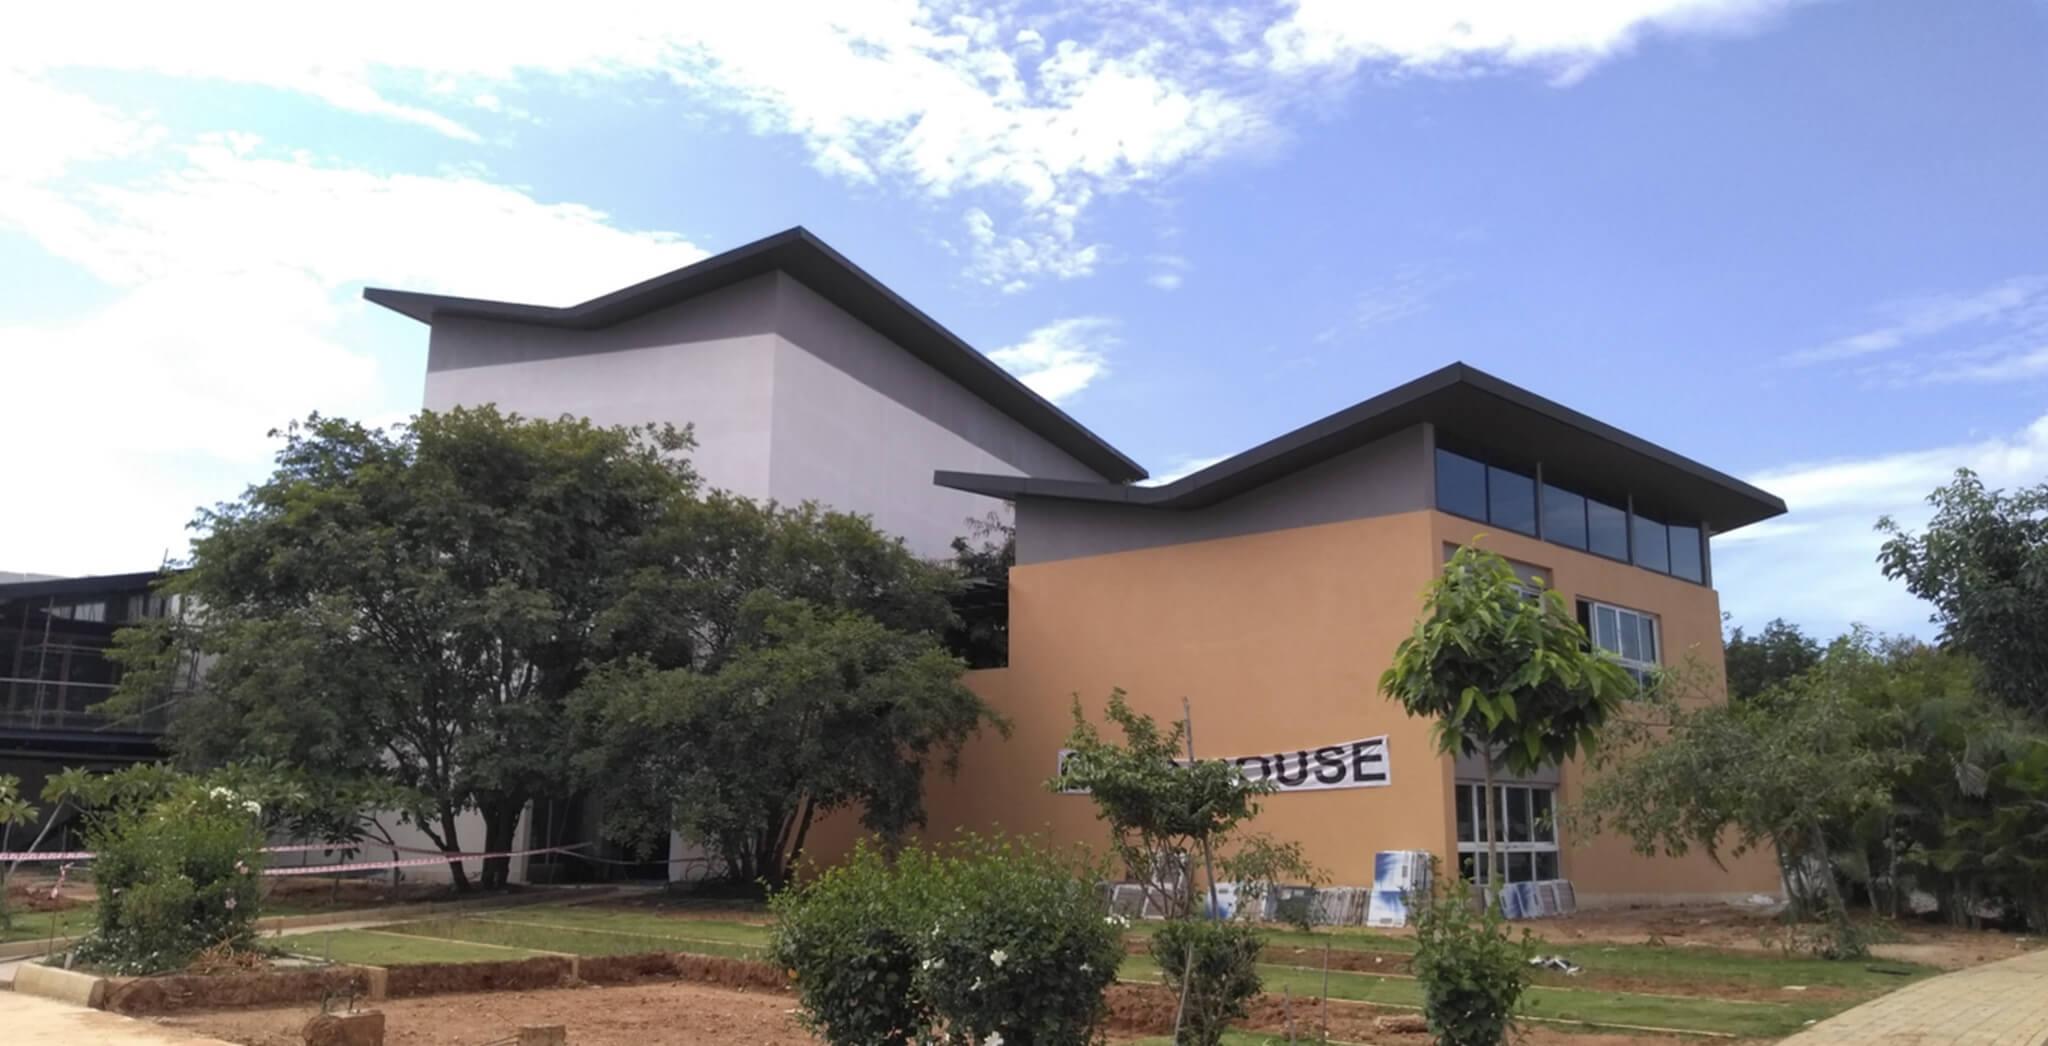 Nov 2019 - Clubhouse